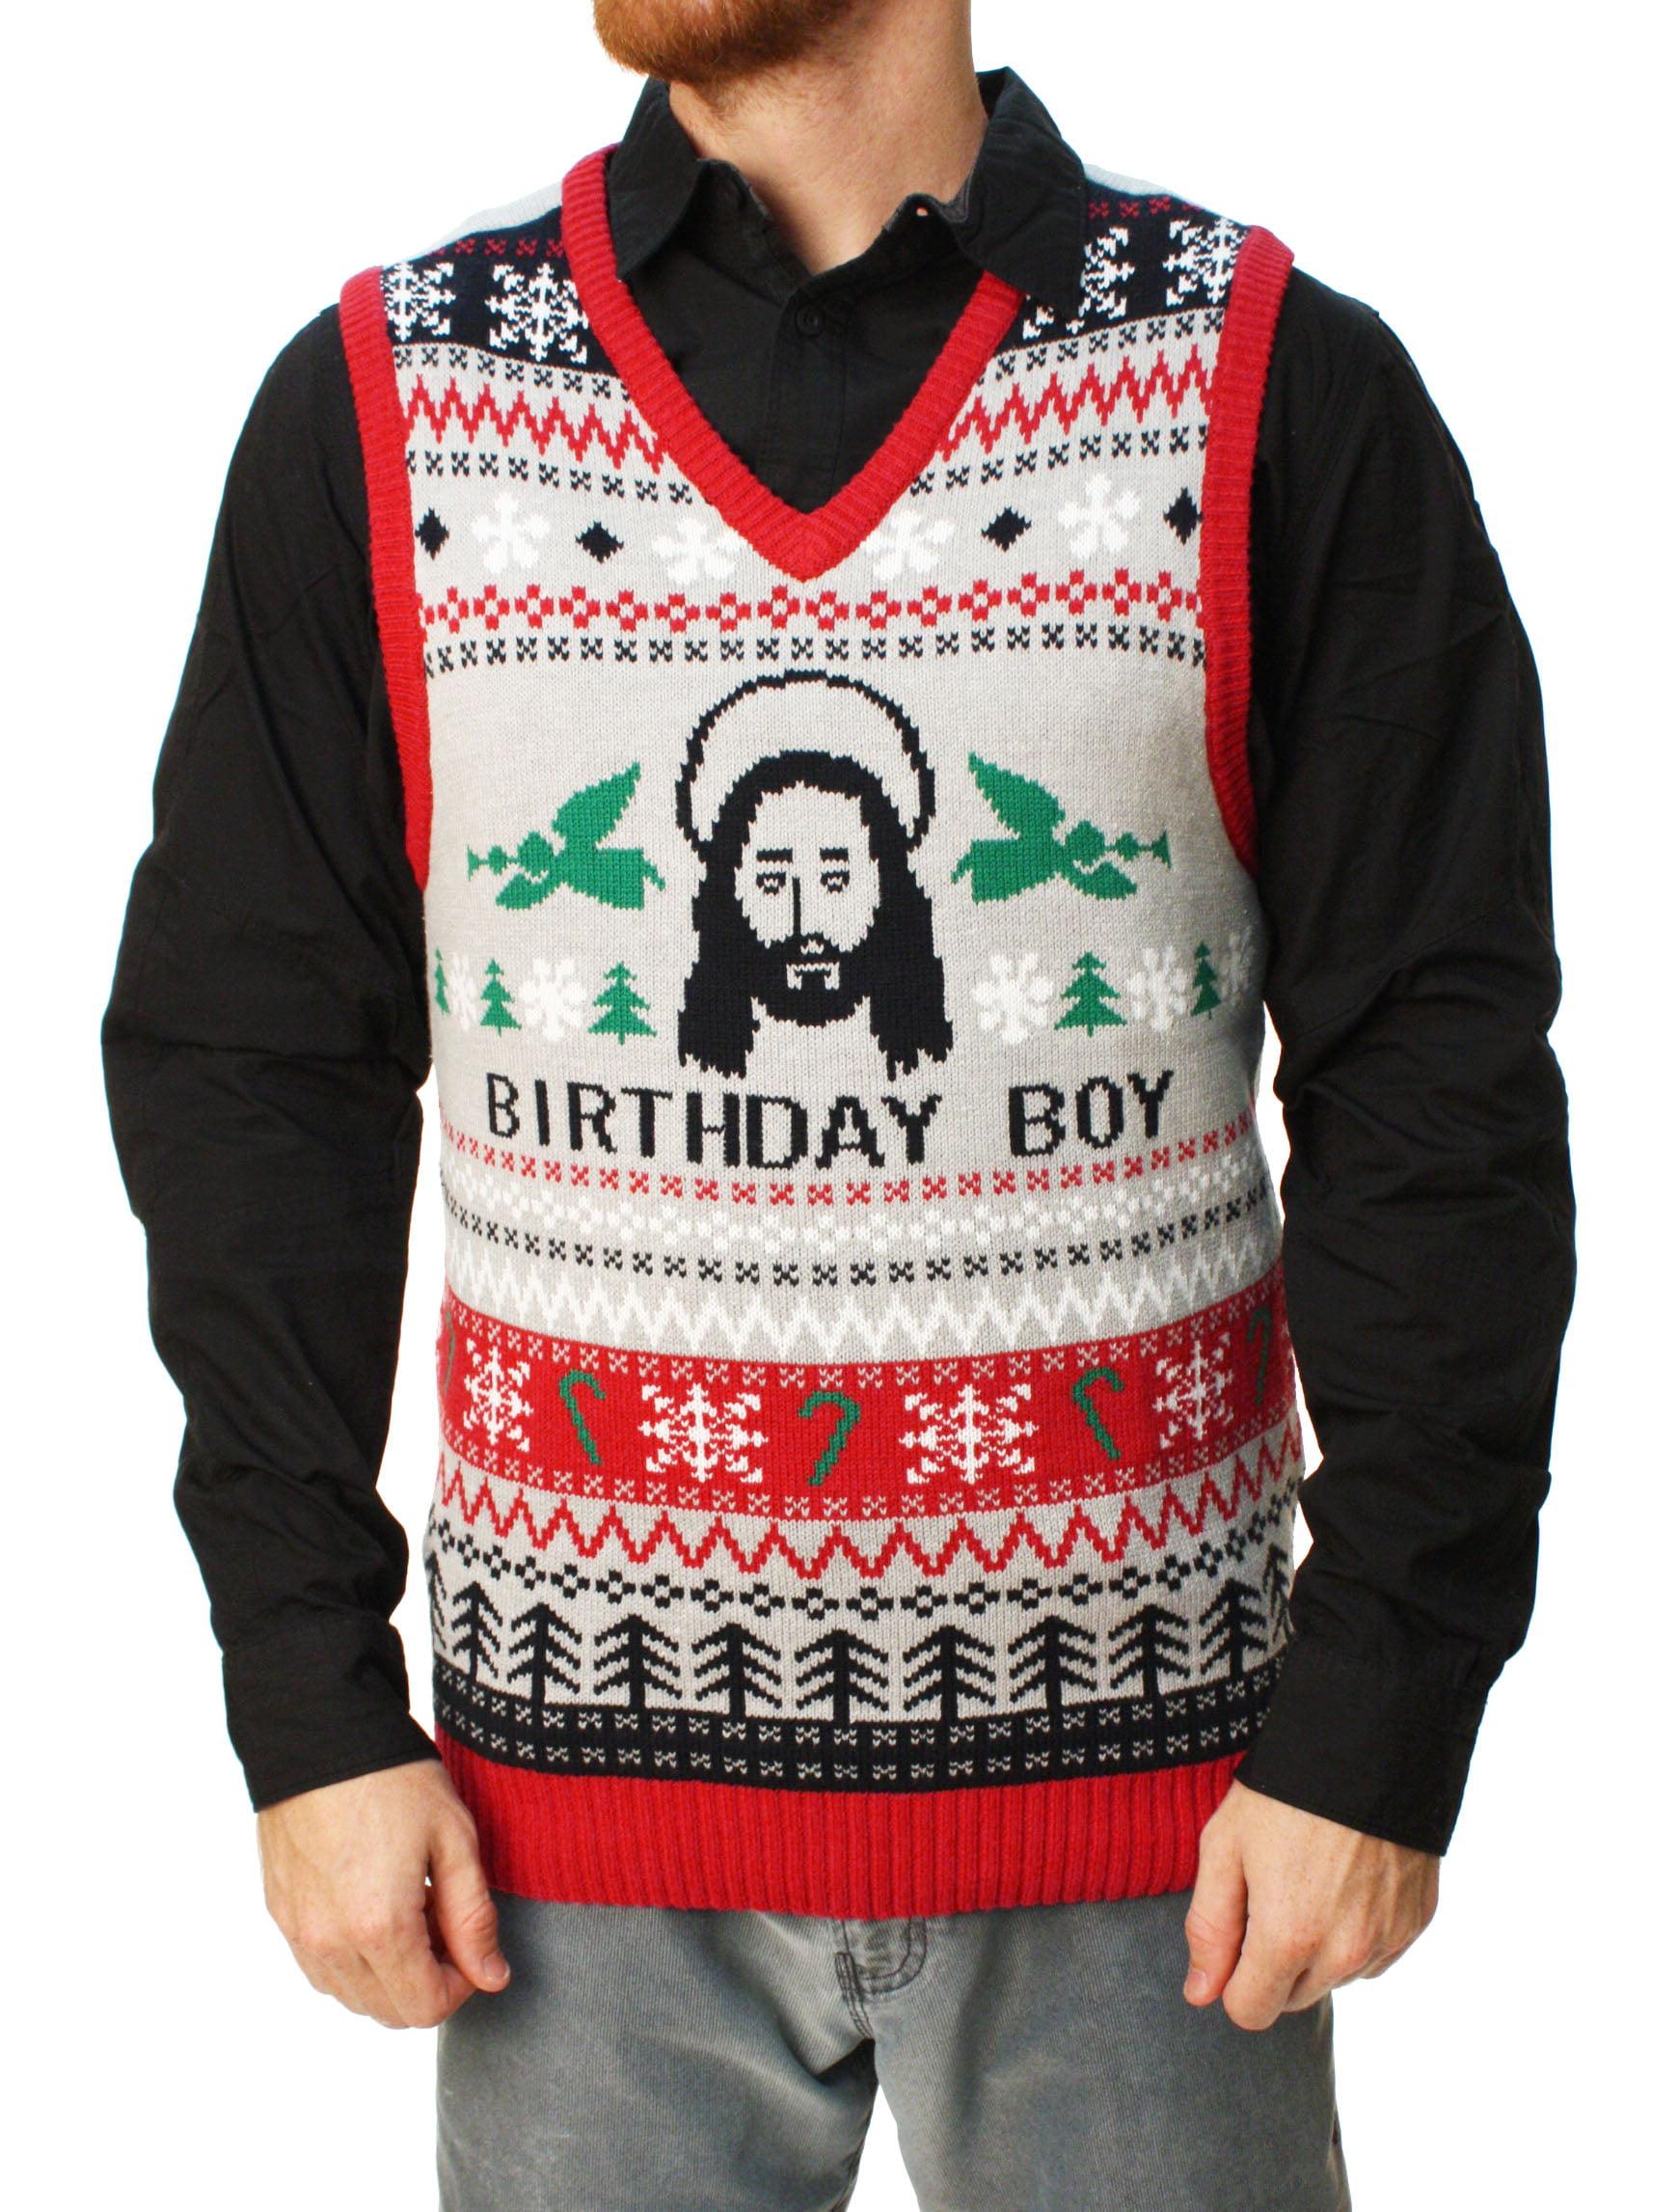 0bf2ec1d8 Ugly Christmas Sweater Men's Jesus Birthday Boy Vest - Walmart.com